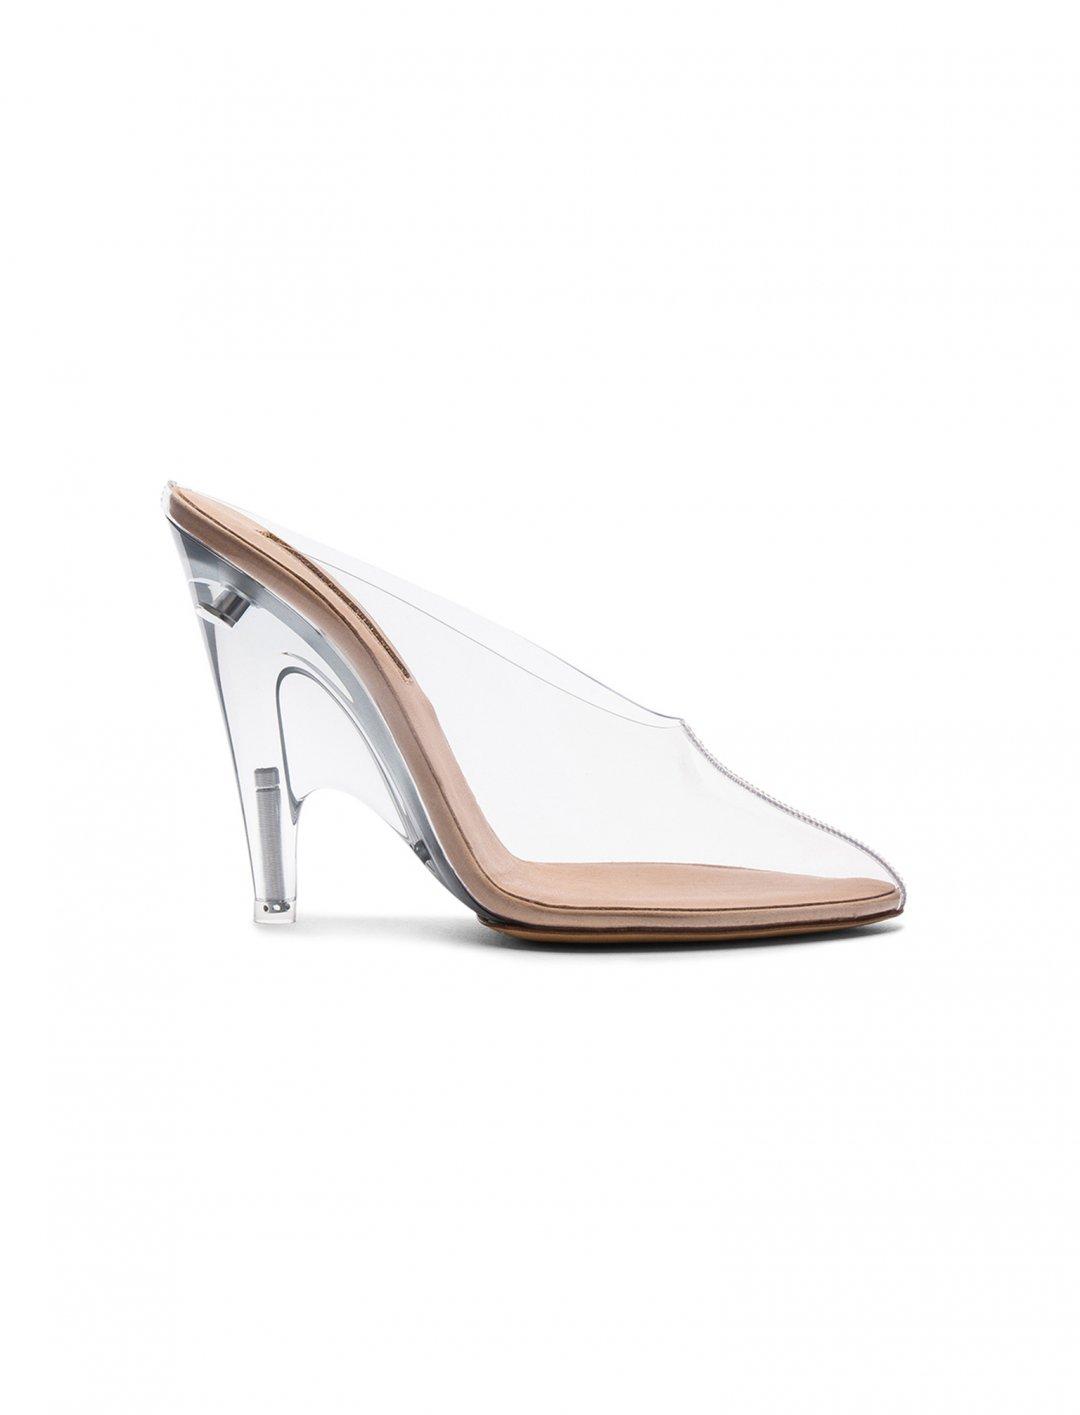 Chritina Aguilera's PVC Mules Shoes Yeezy